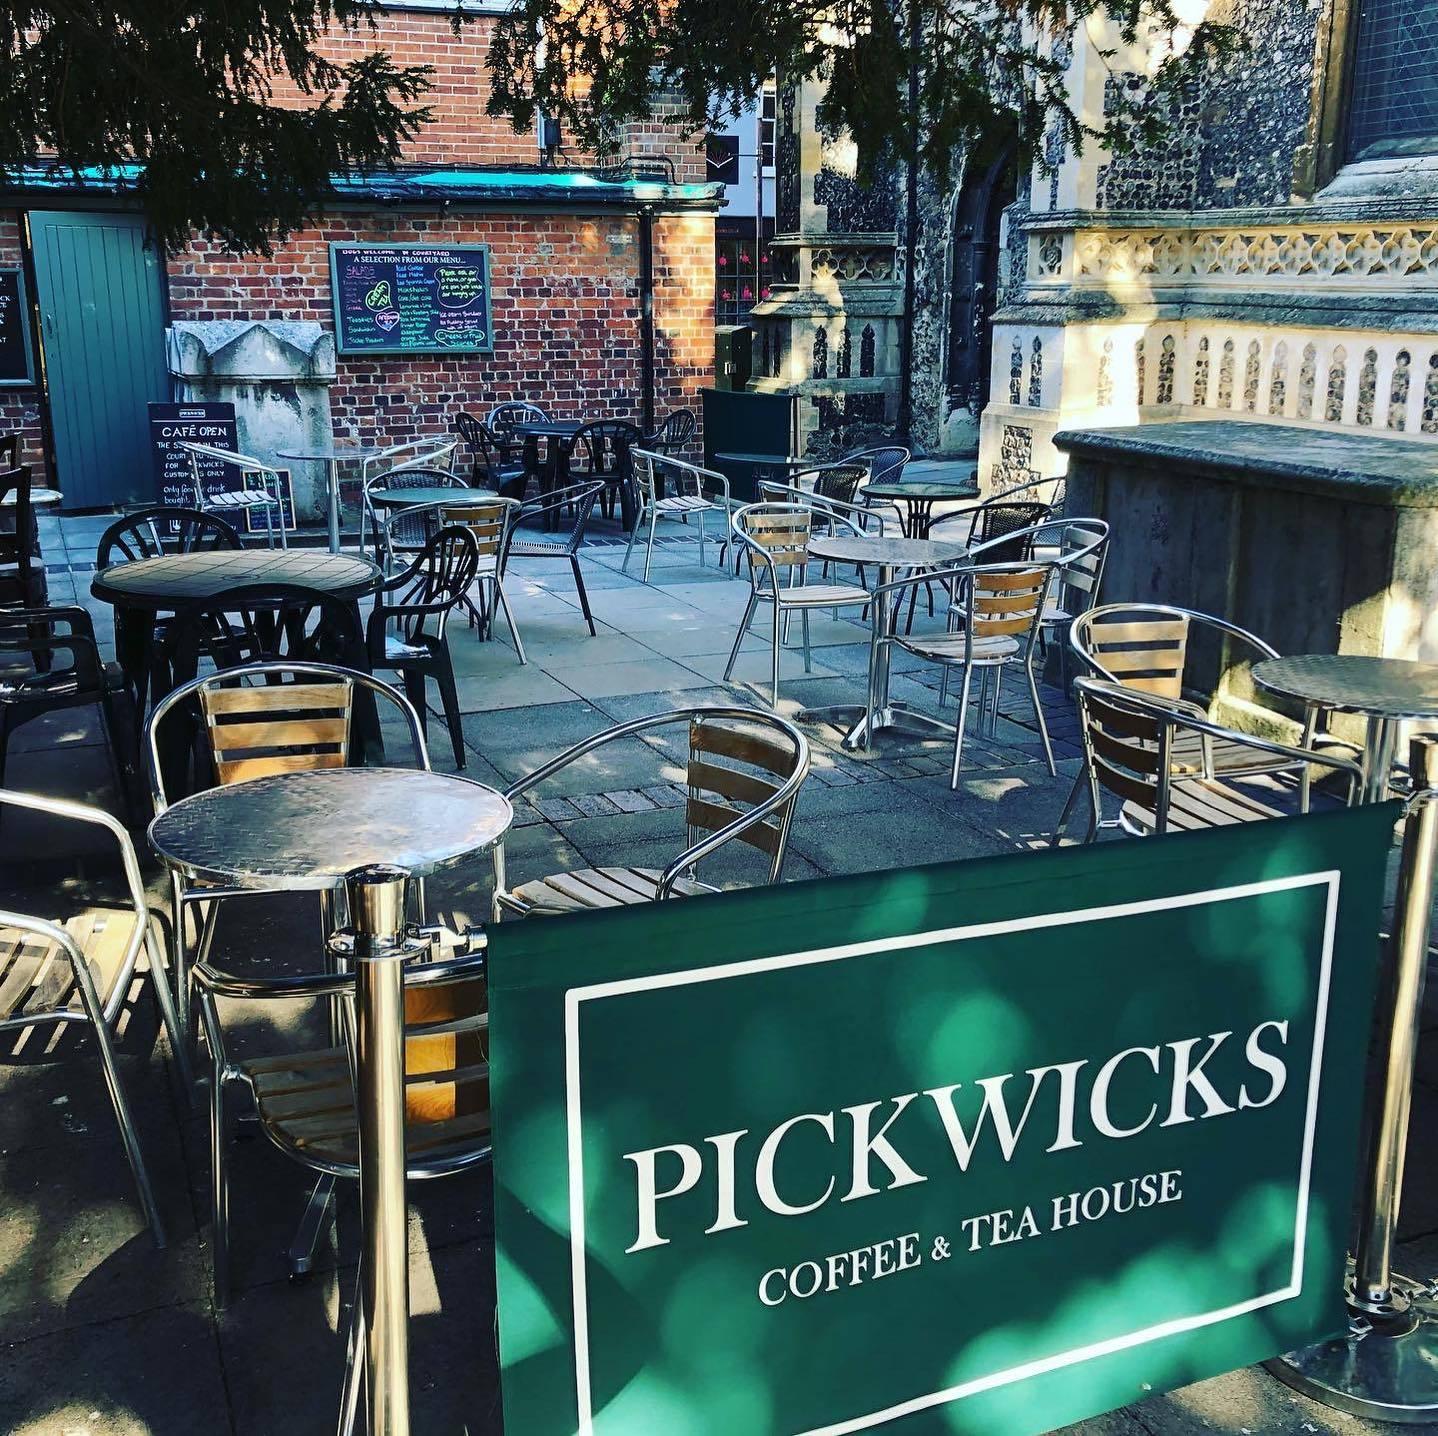 Pickwicks